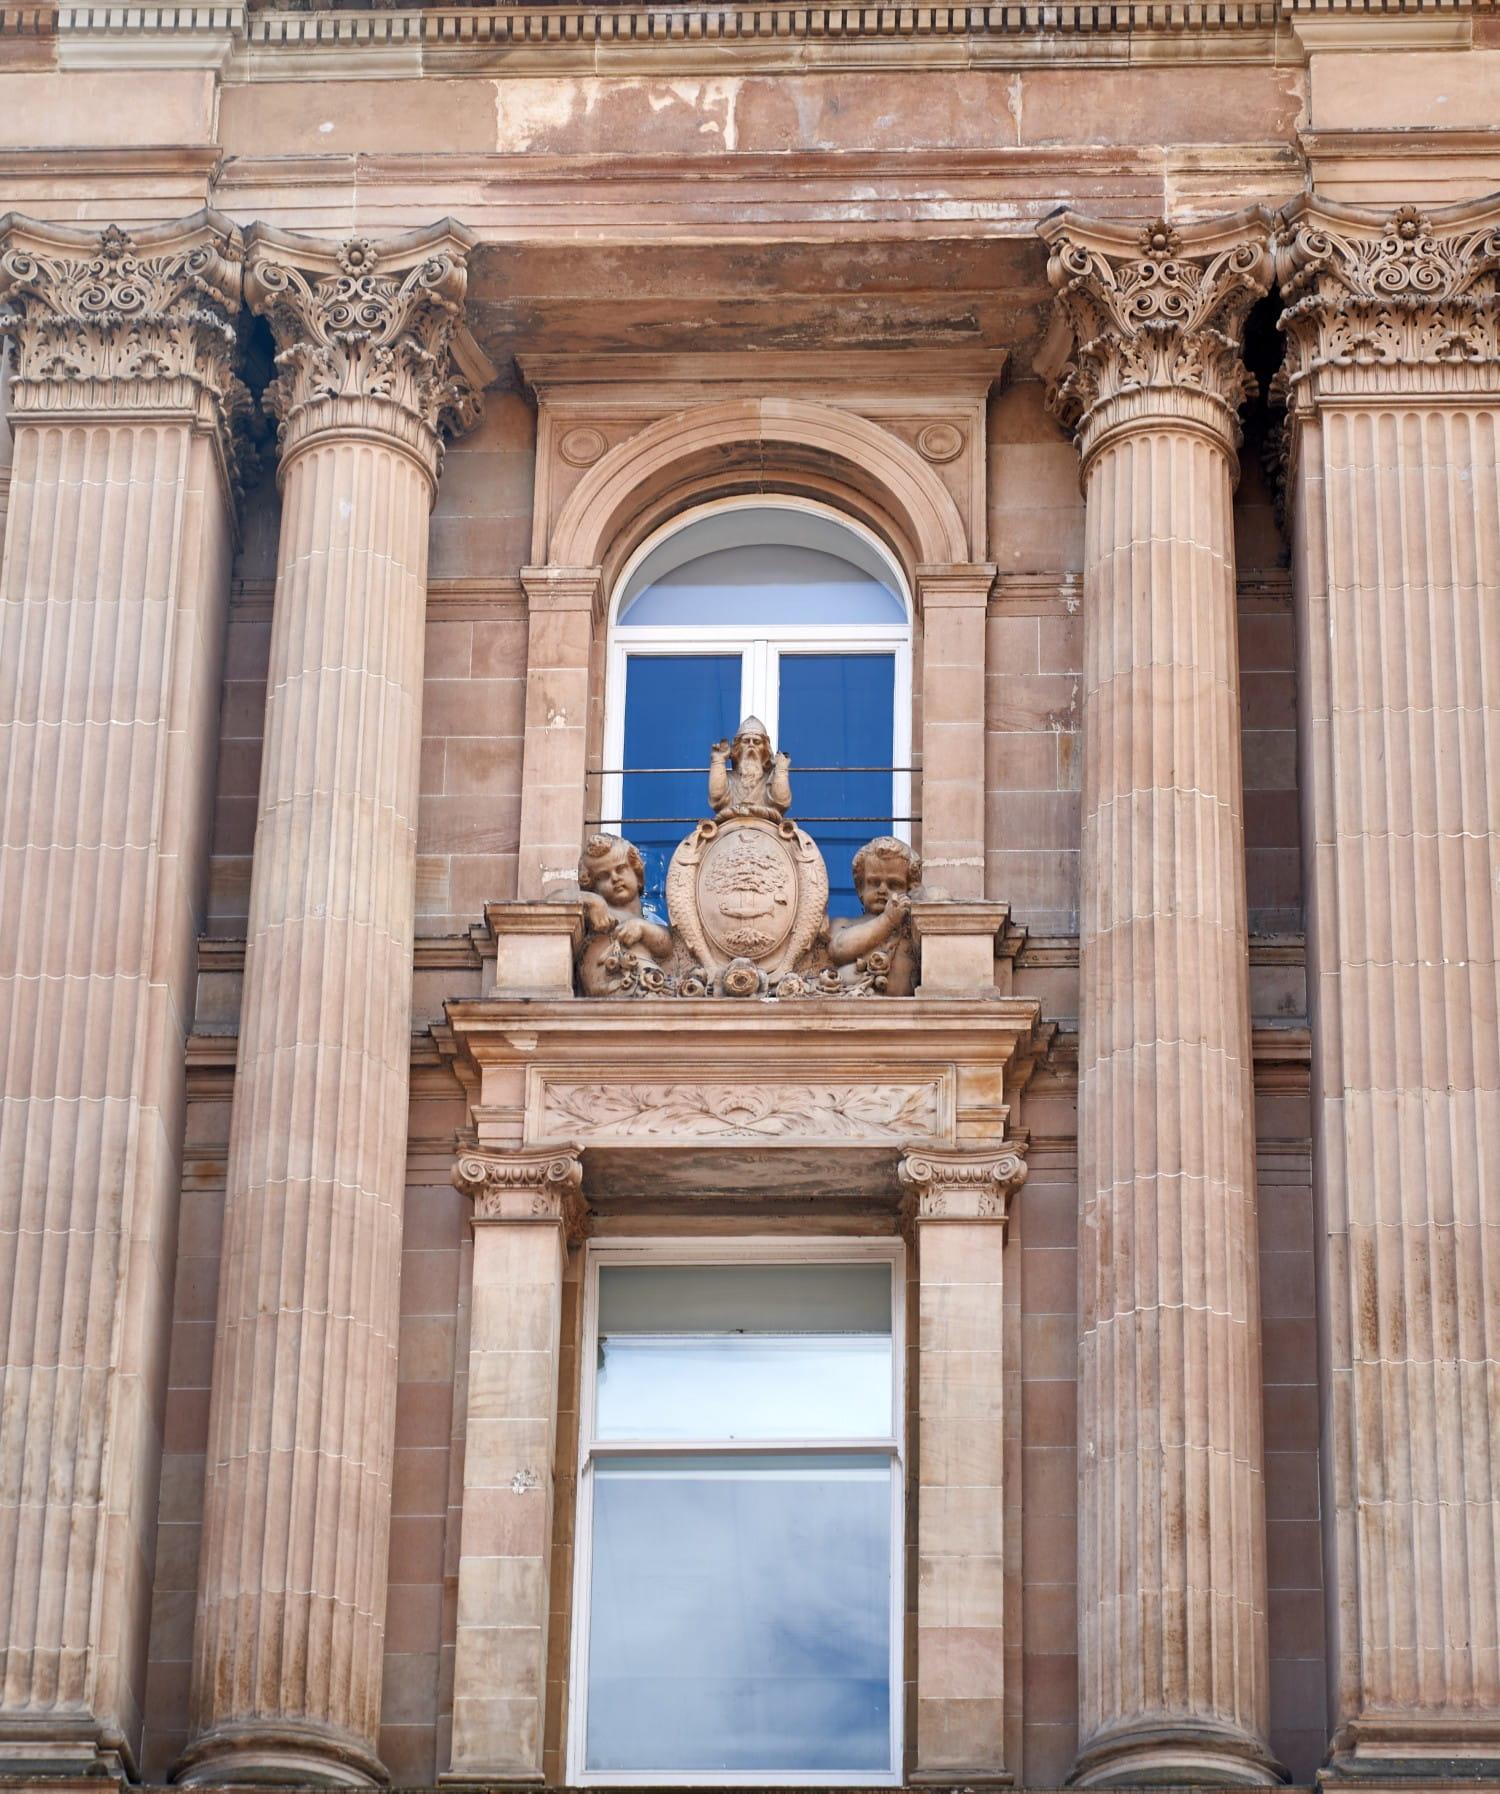 Pillars of wisdom. toshiepix